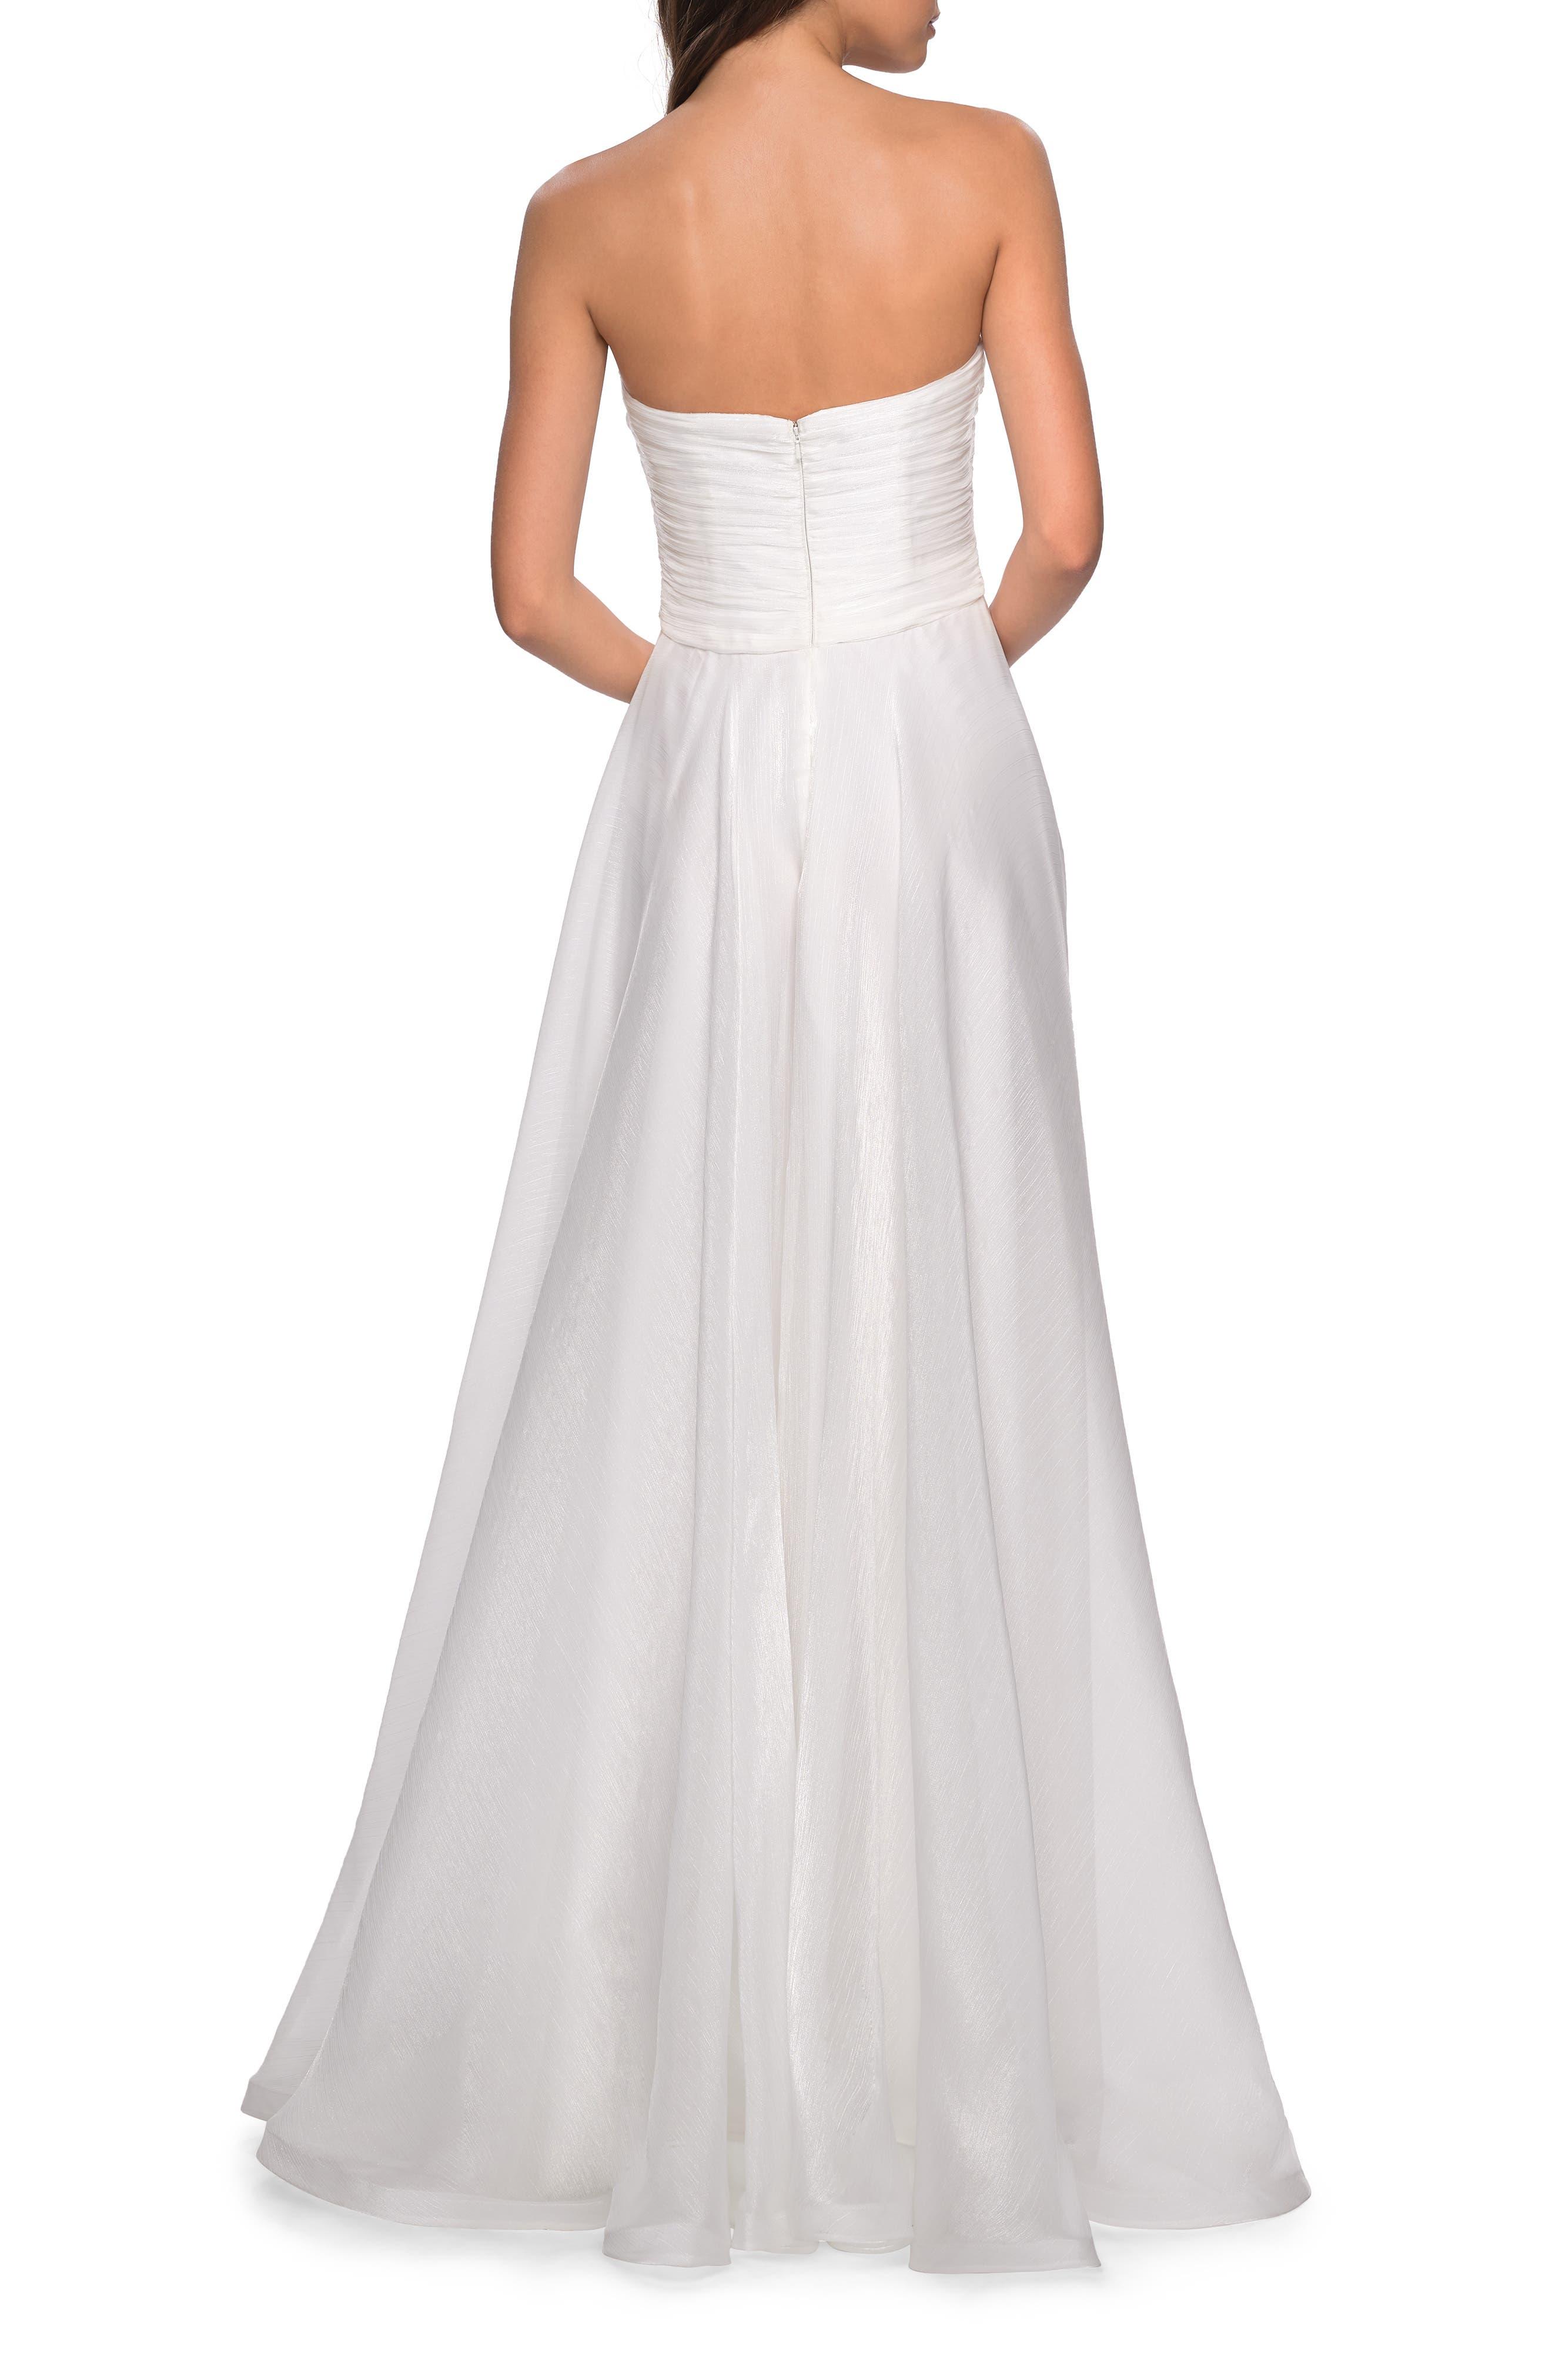 LA FEMME, Strapless Metallic Chiffon Evening Dress, Alternate thumbnail 2, color, WHITE